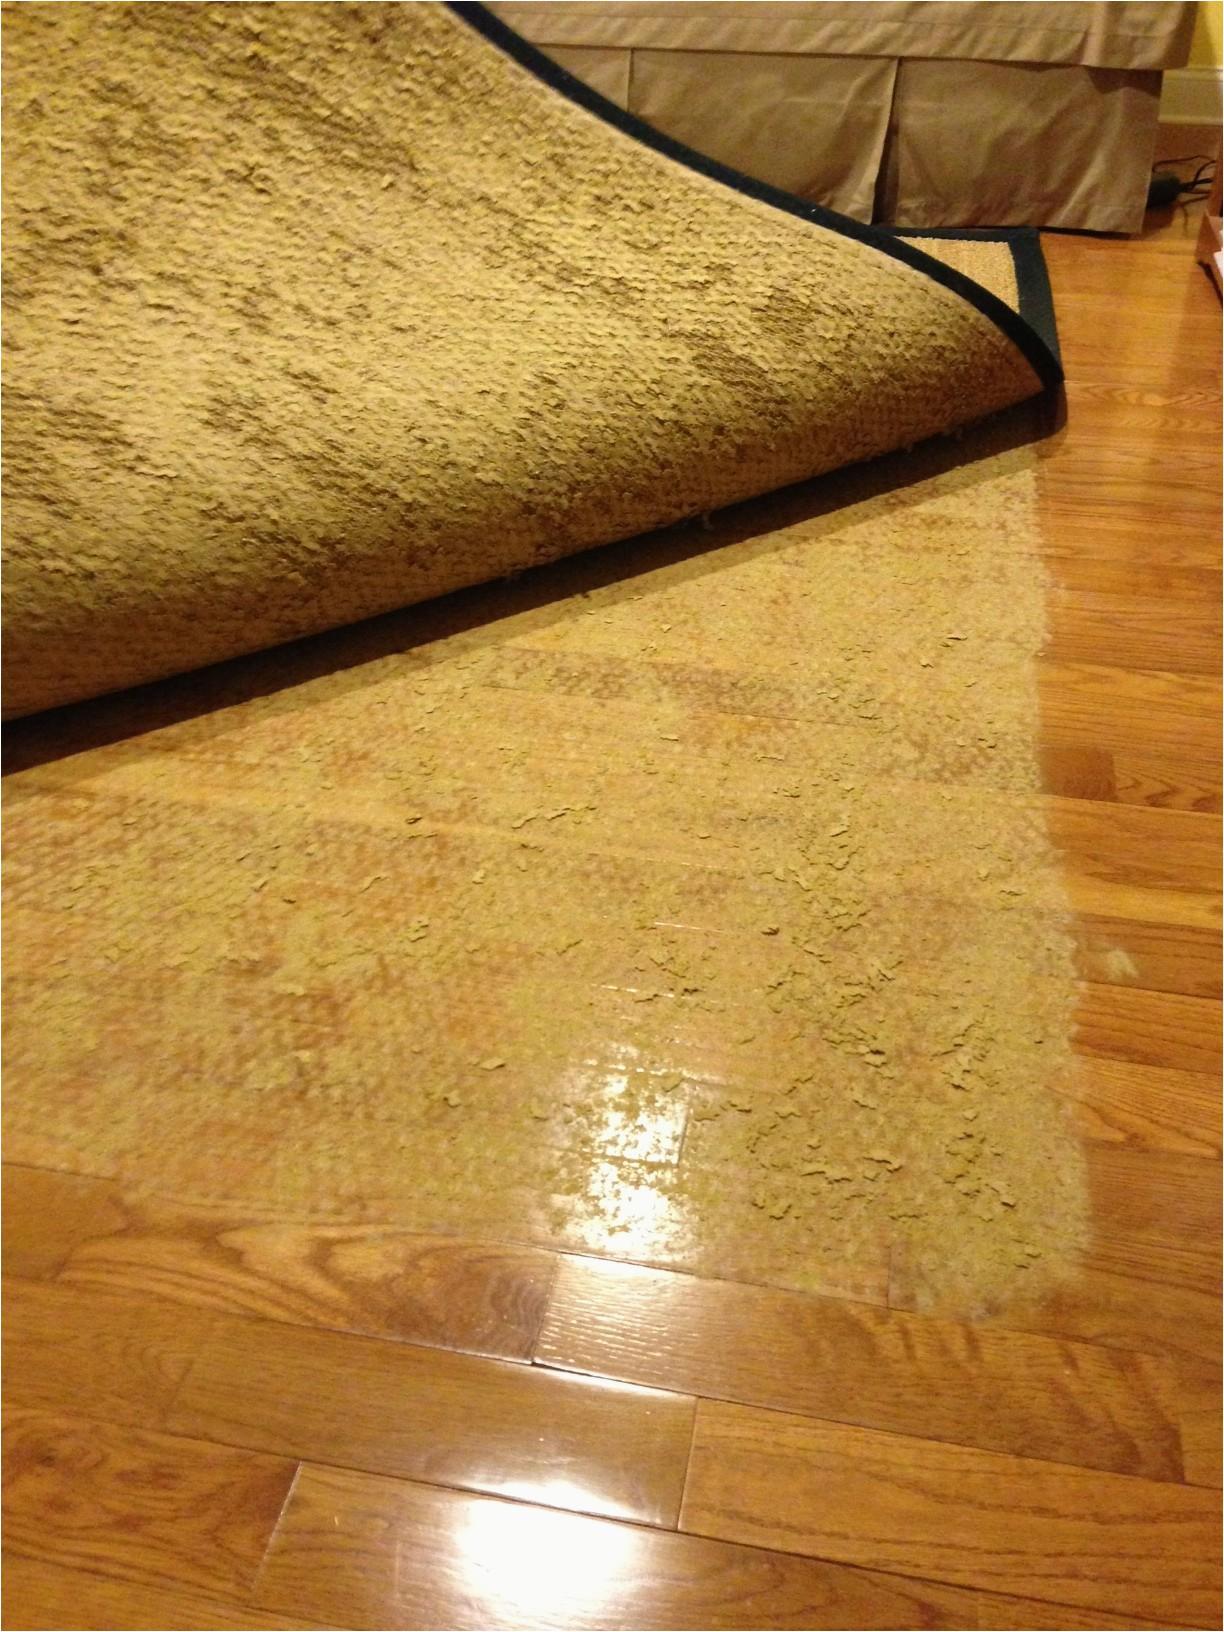 Latex Backed area Rugs On Hardwood Floors Latex Rug Backing Stuck to Floor